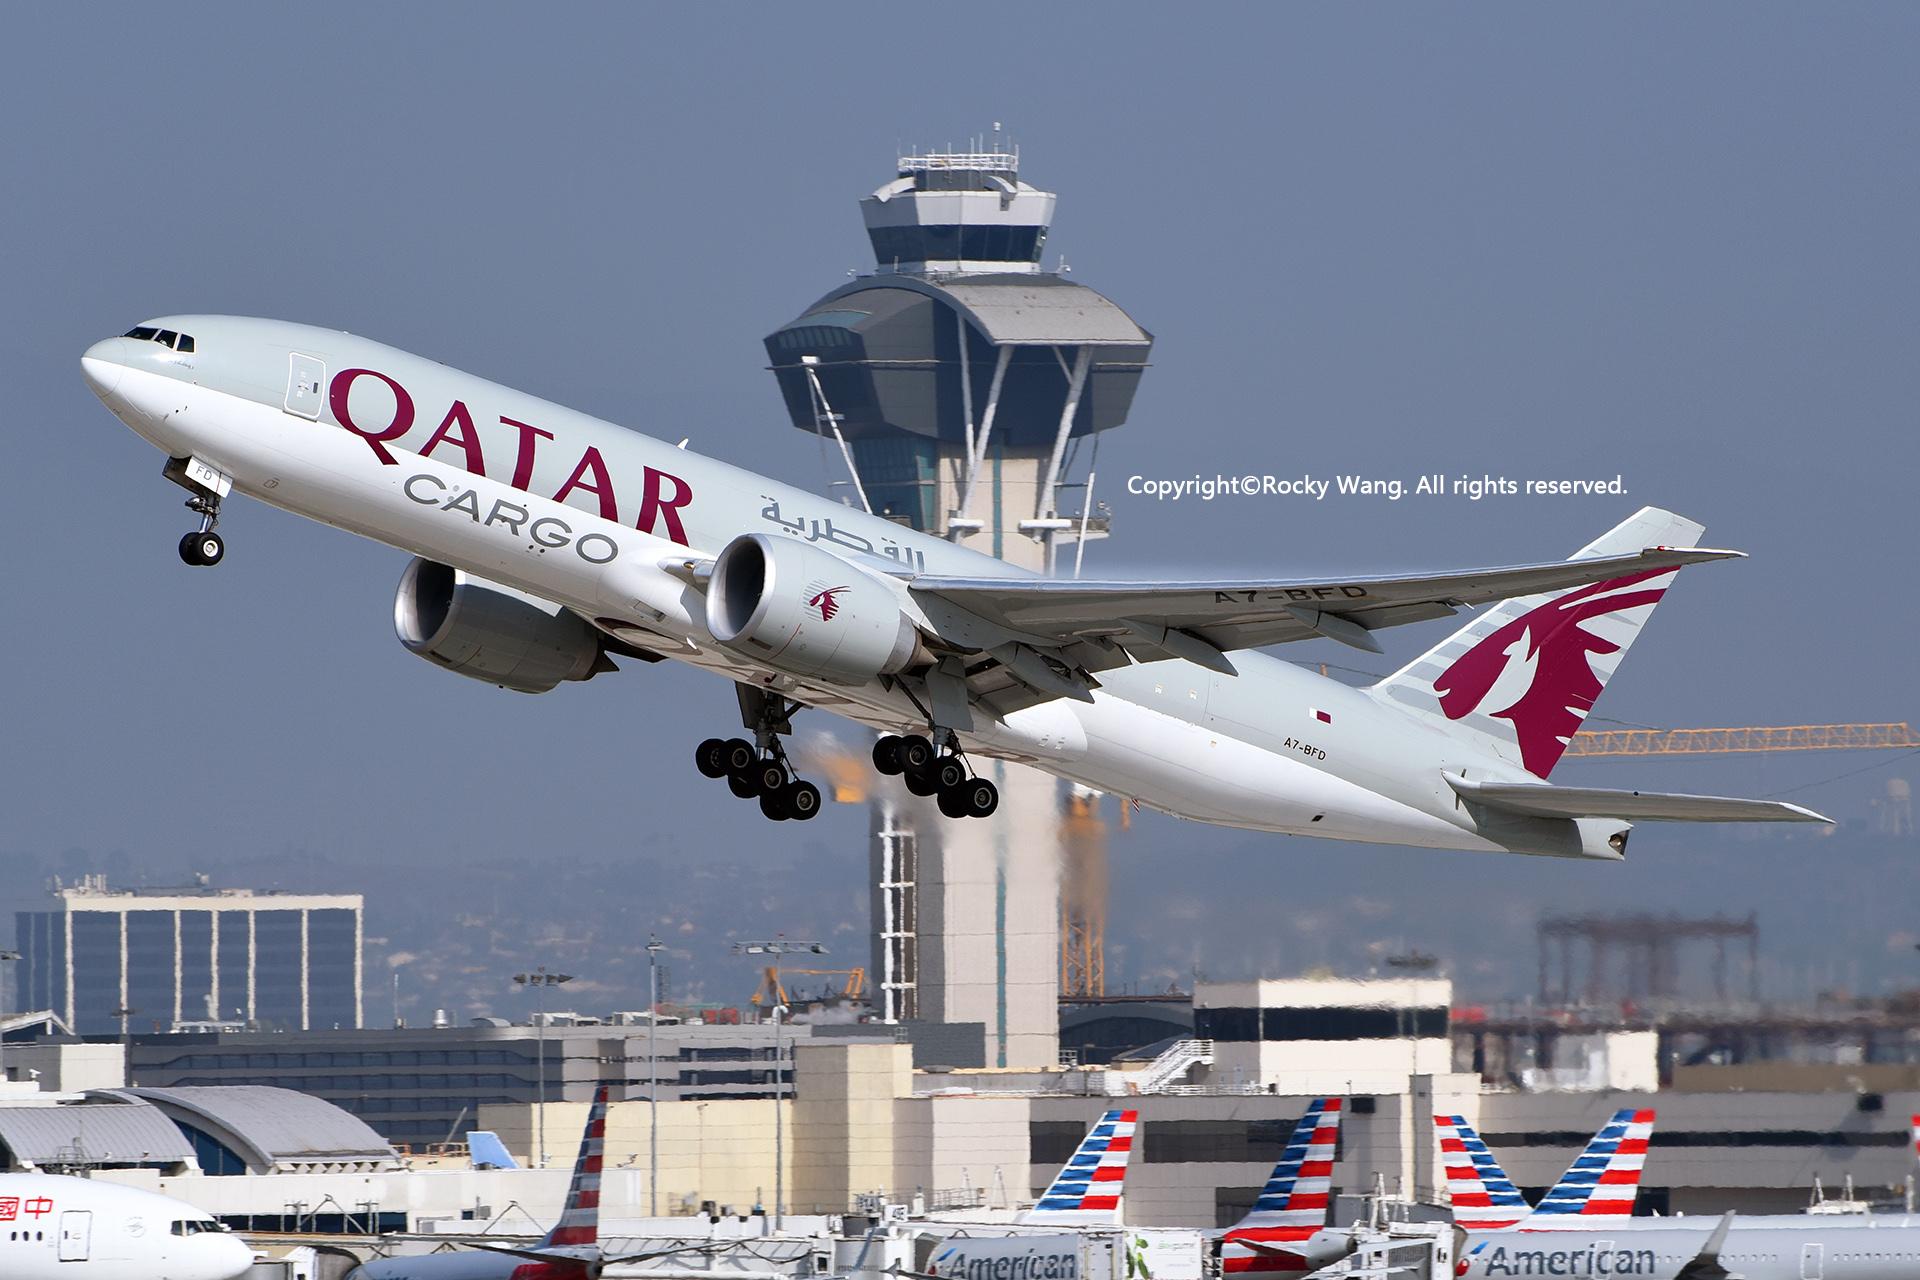 Re:[原创]居家了 批量处理老图 倾情奉献52家777 BOEING 777-FDZ A7-BFD Los Angeles Int'l Airport